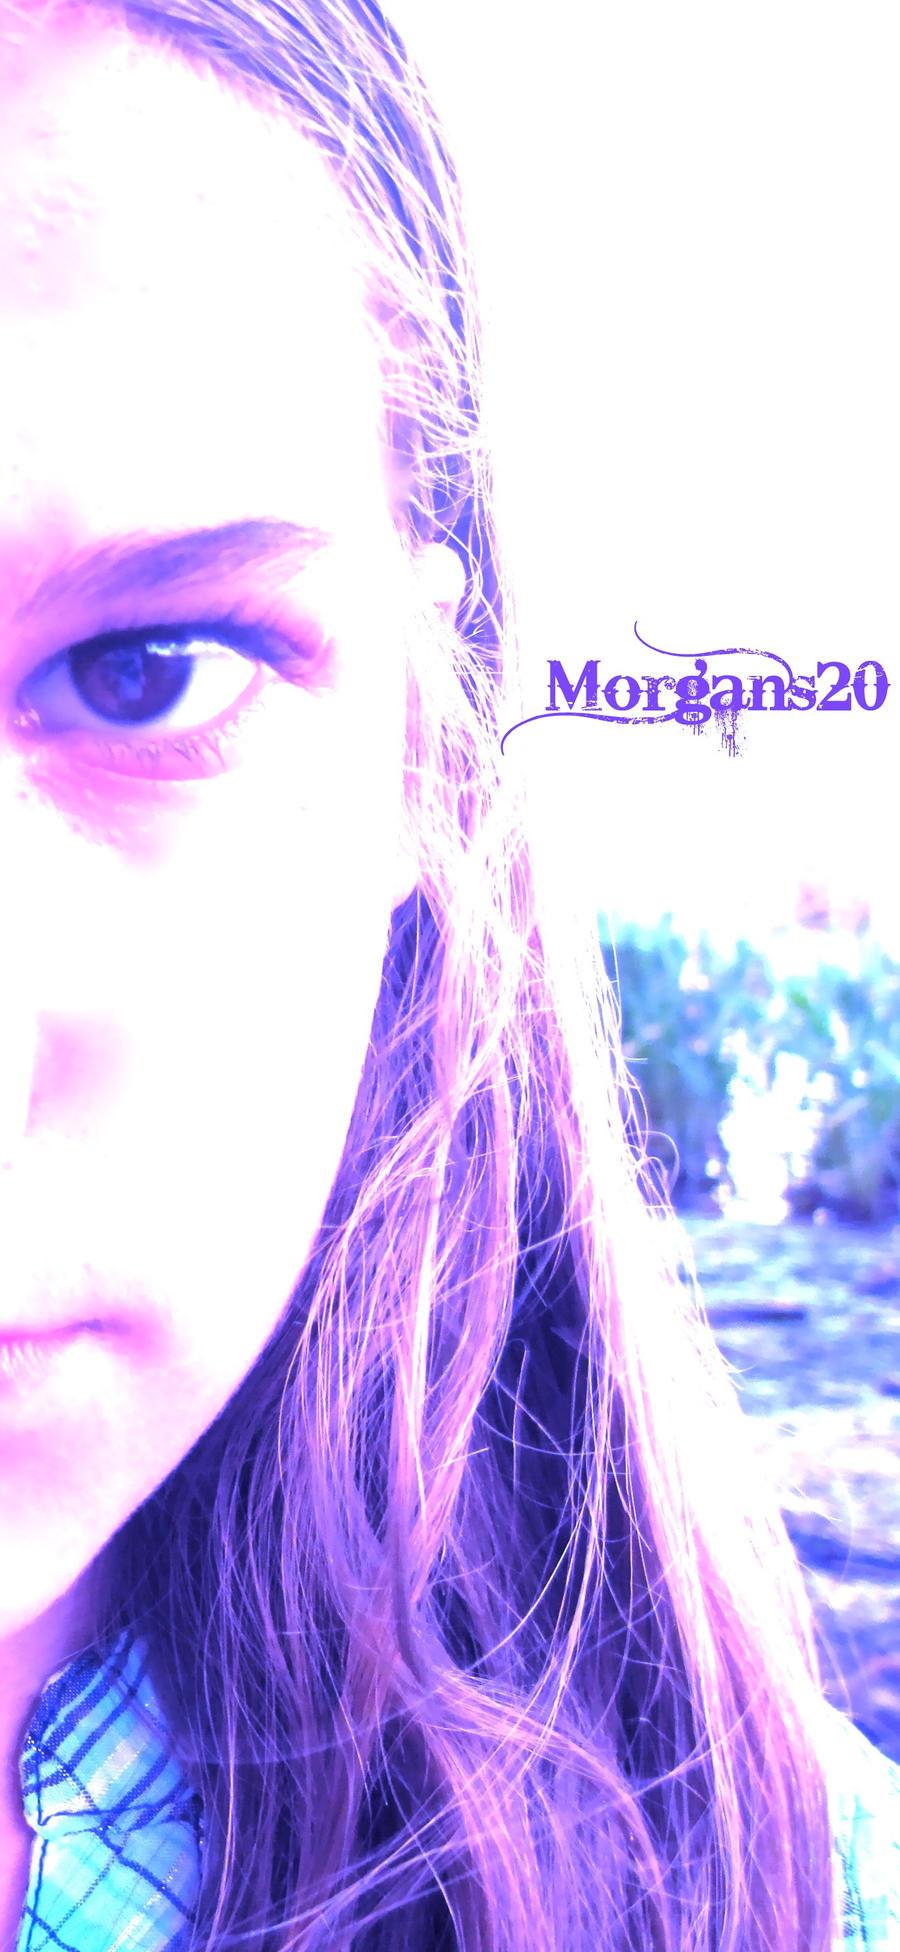 morgans20's Profile Picture